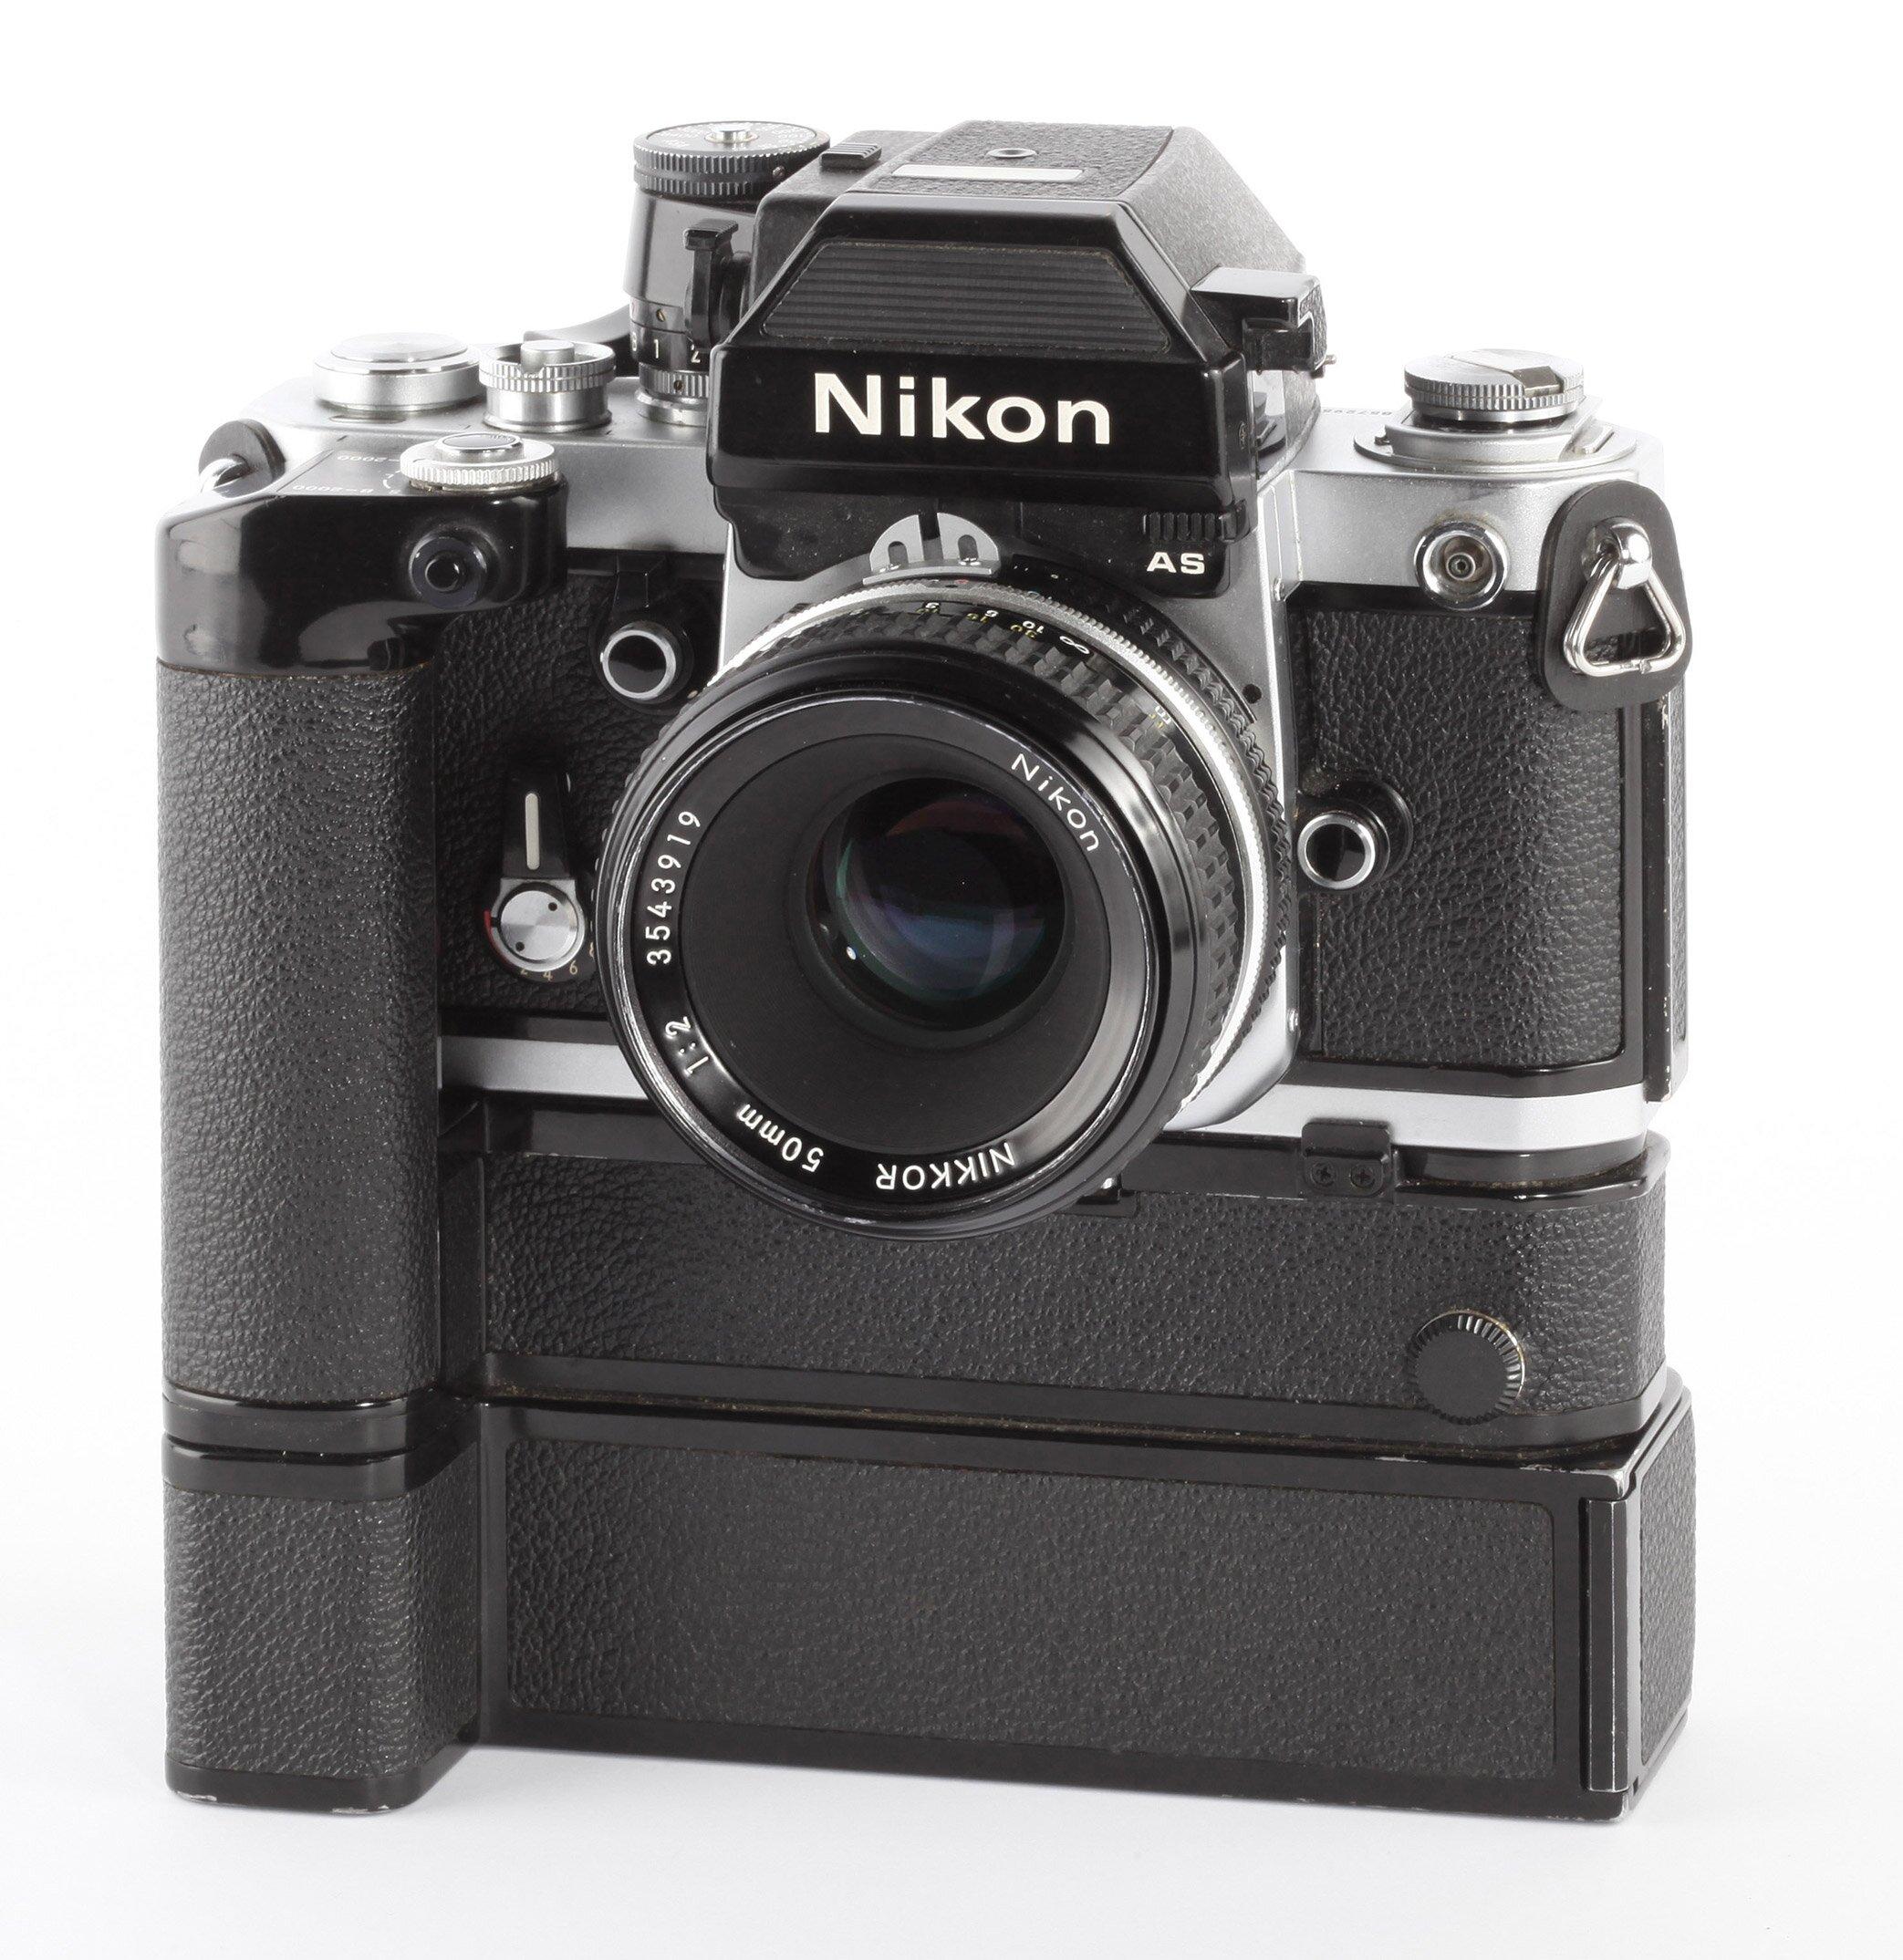 Nikon F2 AS + MB-1 + MD-3 + Nikon 50mm/2,0